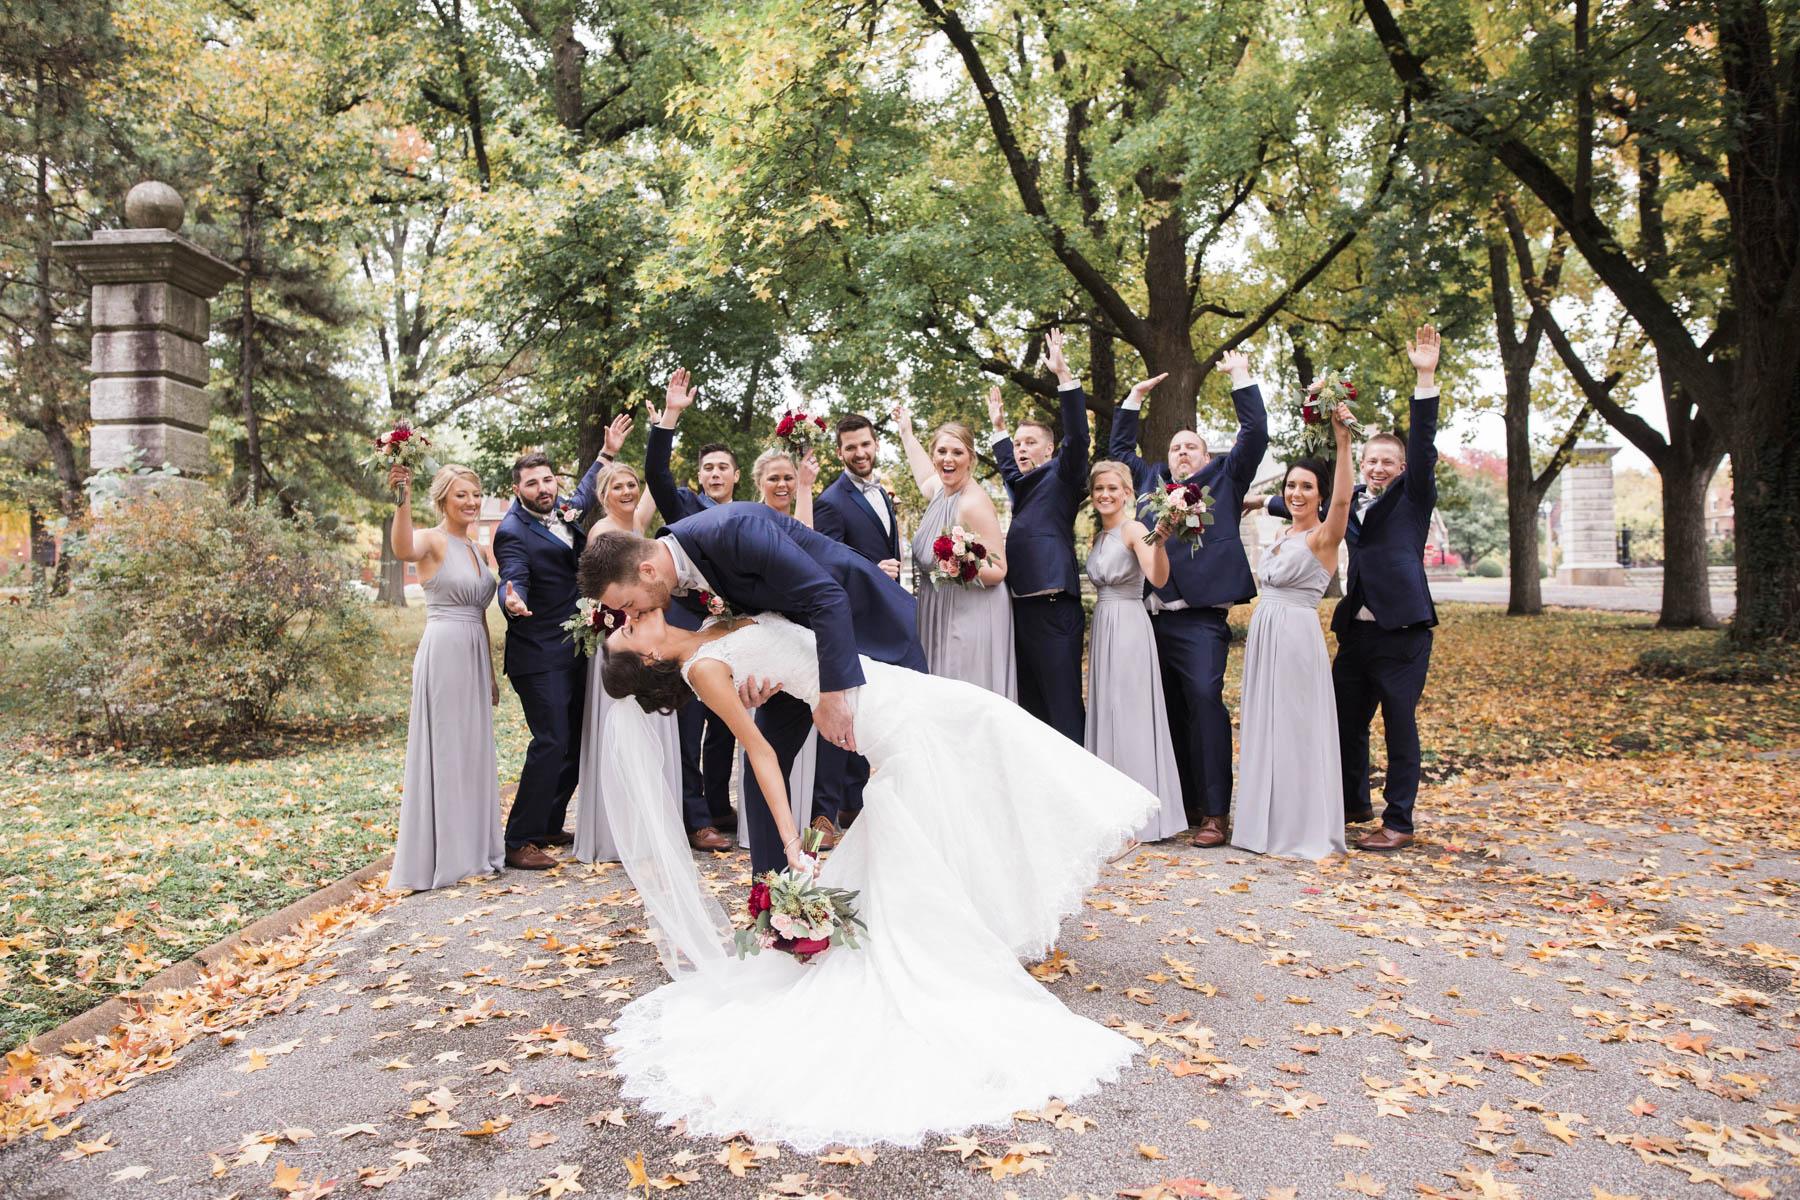 shotbychelsea_blog_wedding-15.jpg